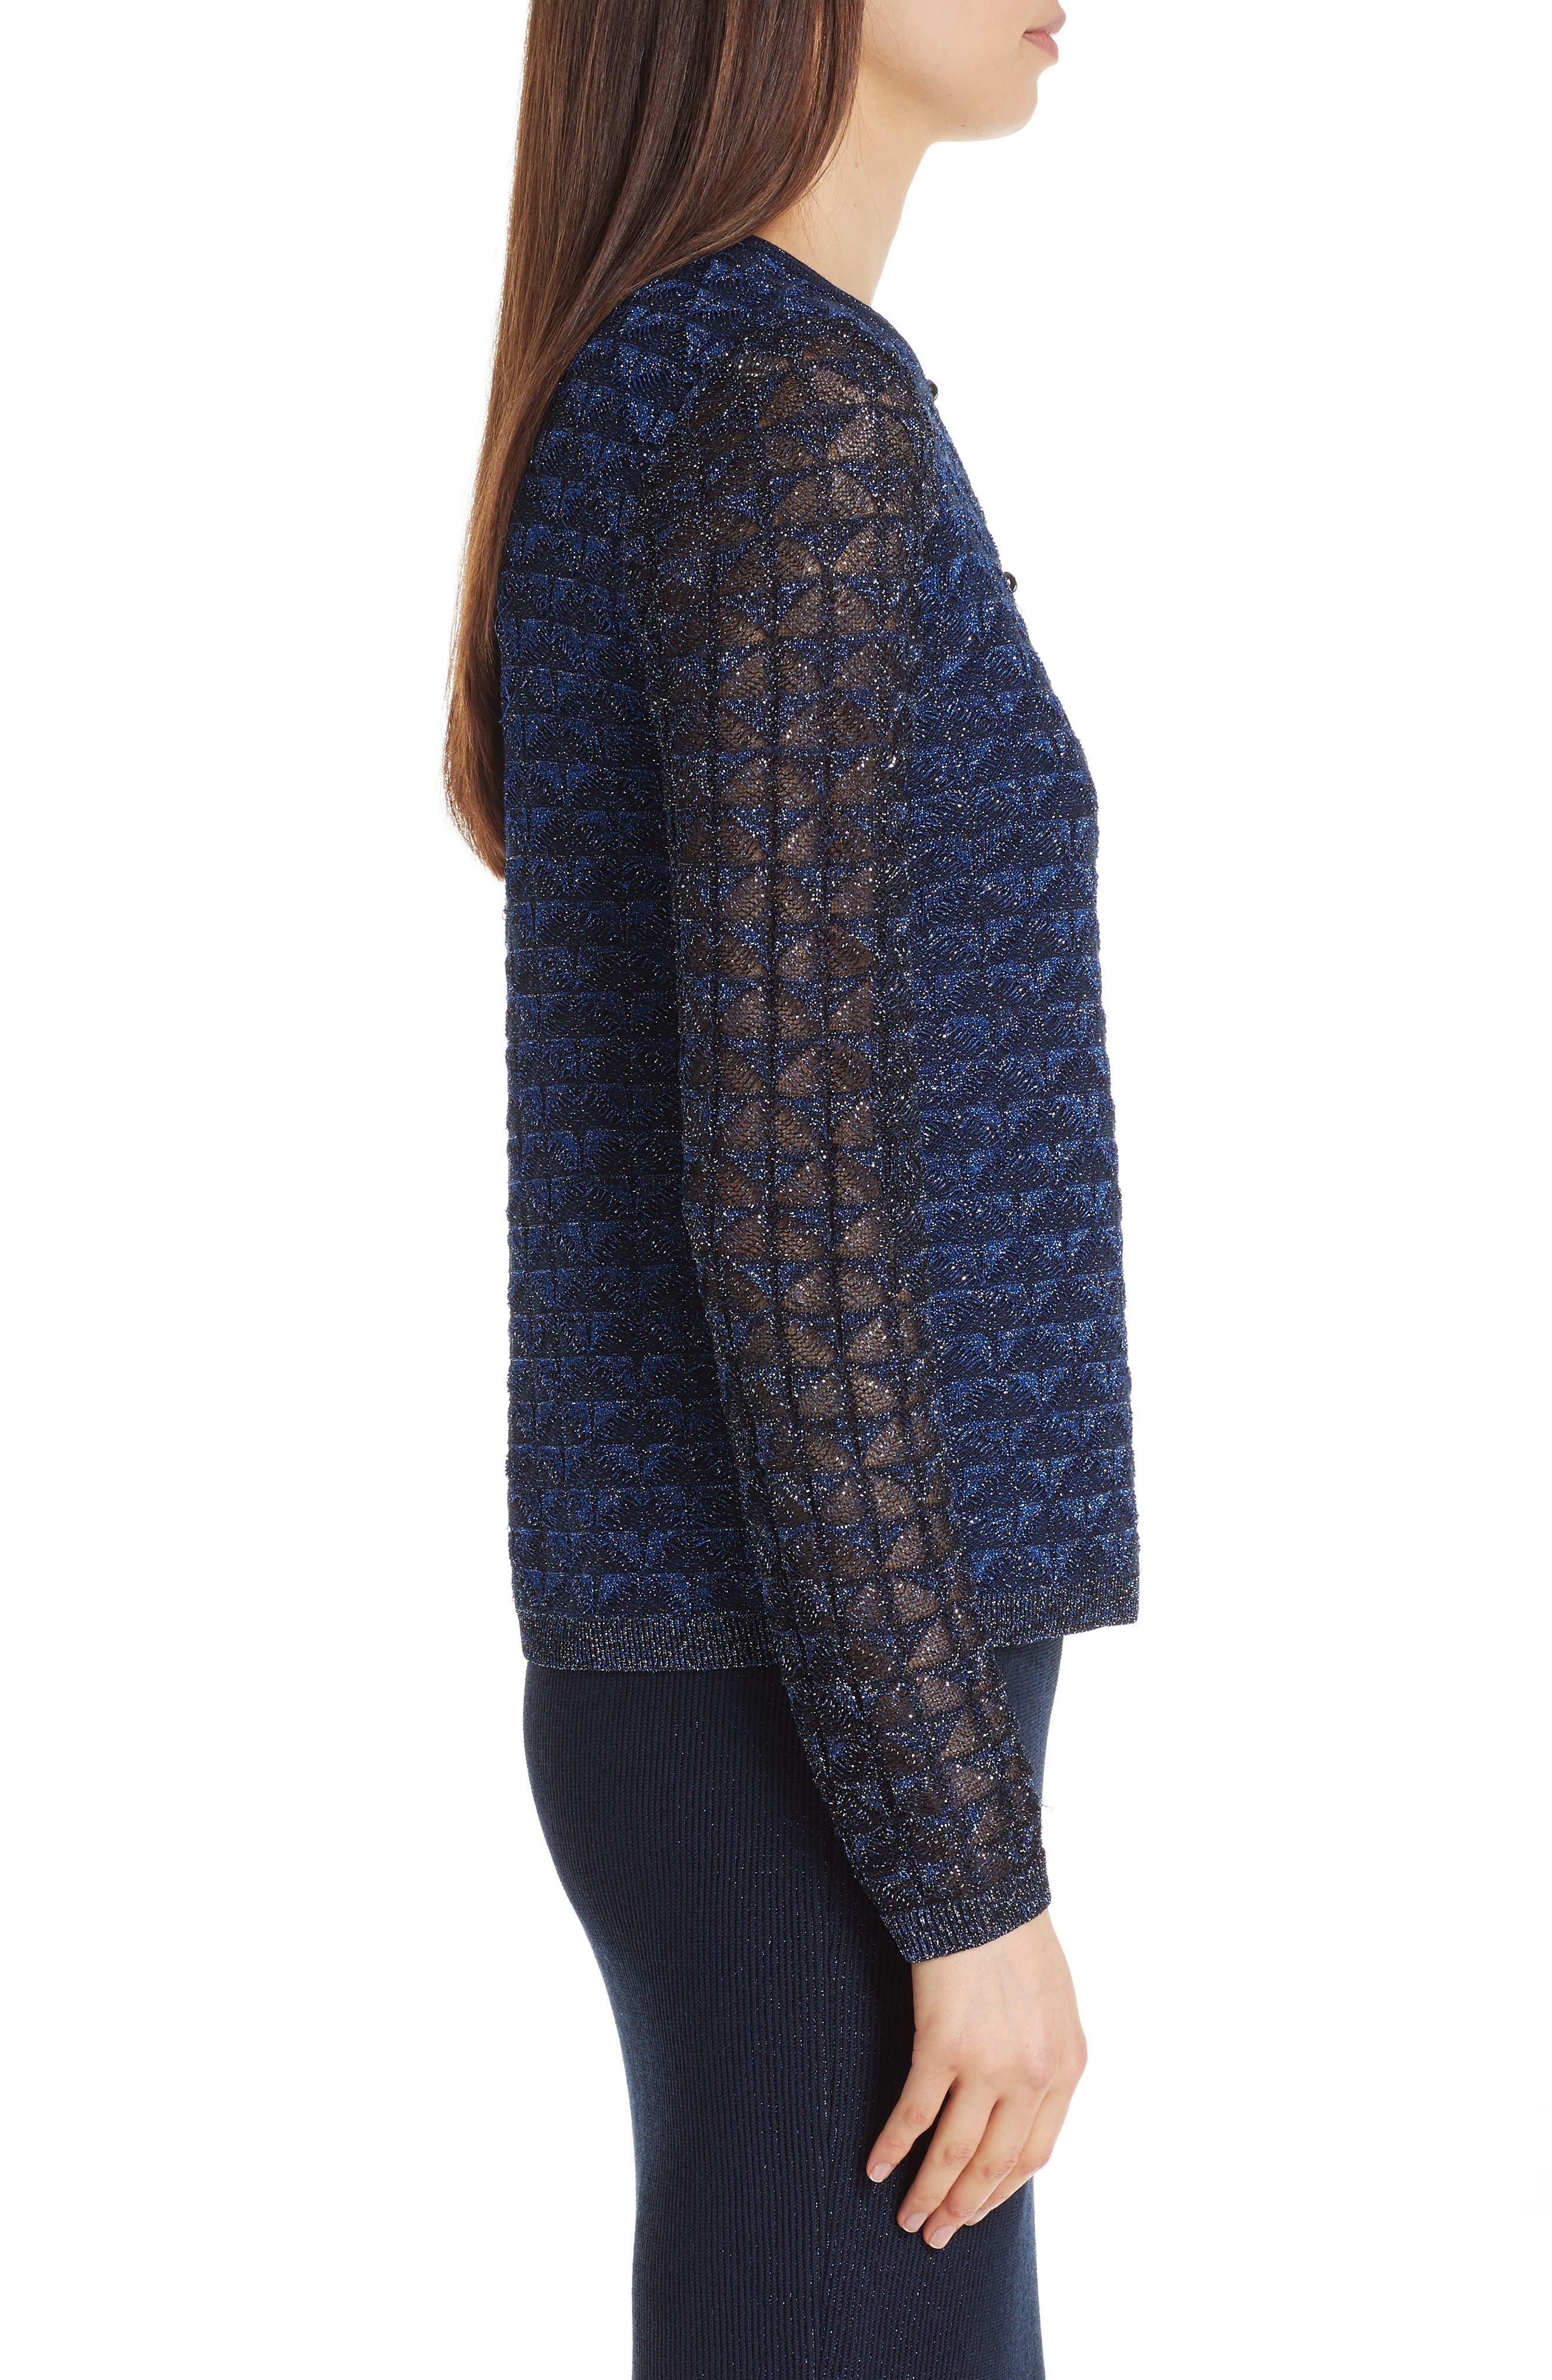 ST. JOHN COLLECTION, Diamond Lace Knit Cardigan, Alternate thumbnail 4, color, NAVY MULTI